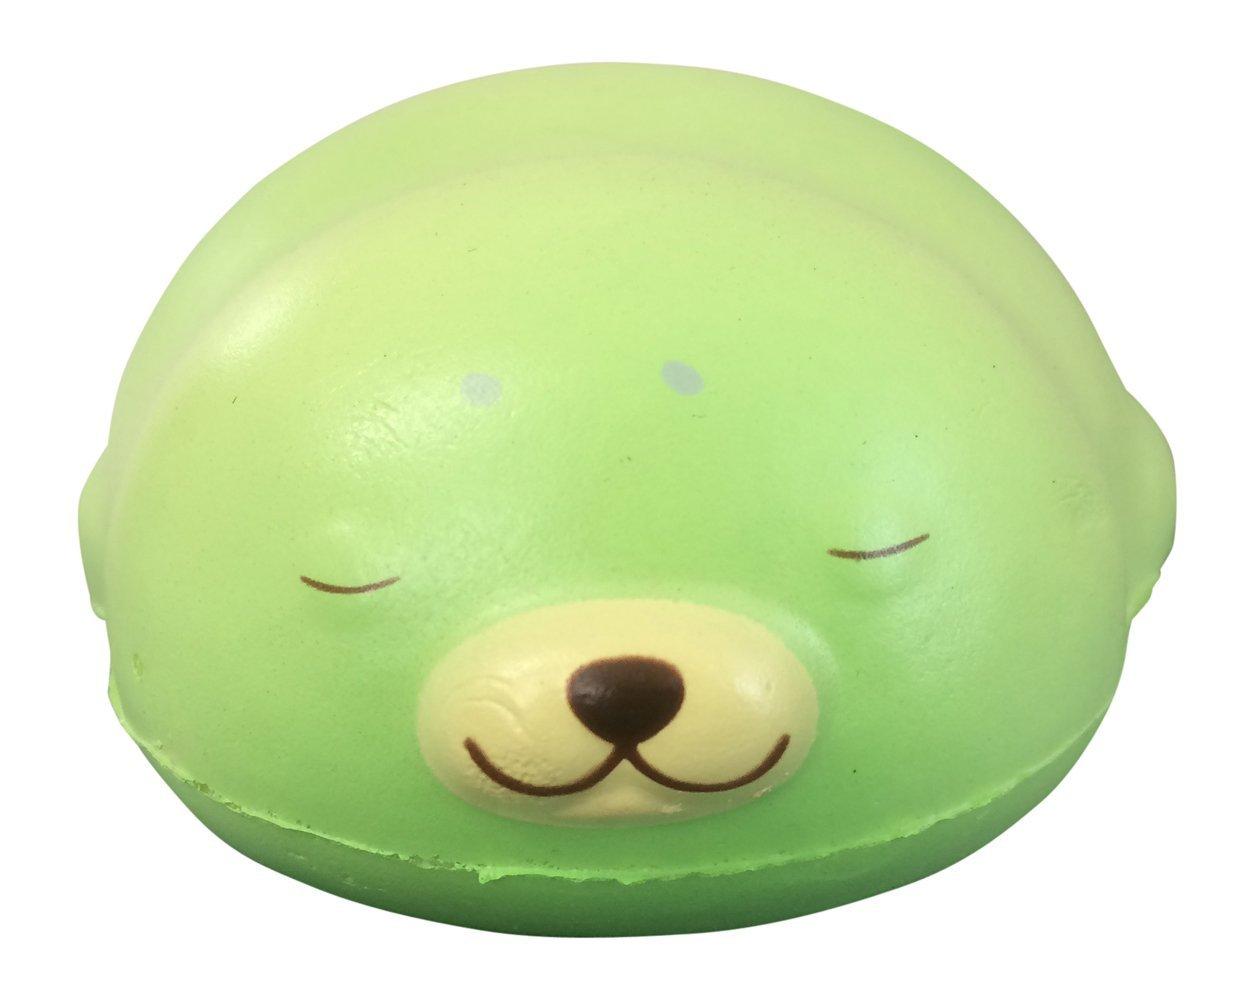 Puni Maru JUMBO Mochi Seal Squishy with Bonus Random Squishy from Jenna Lyn! (Melon)